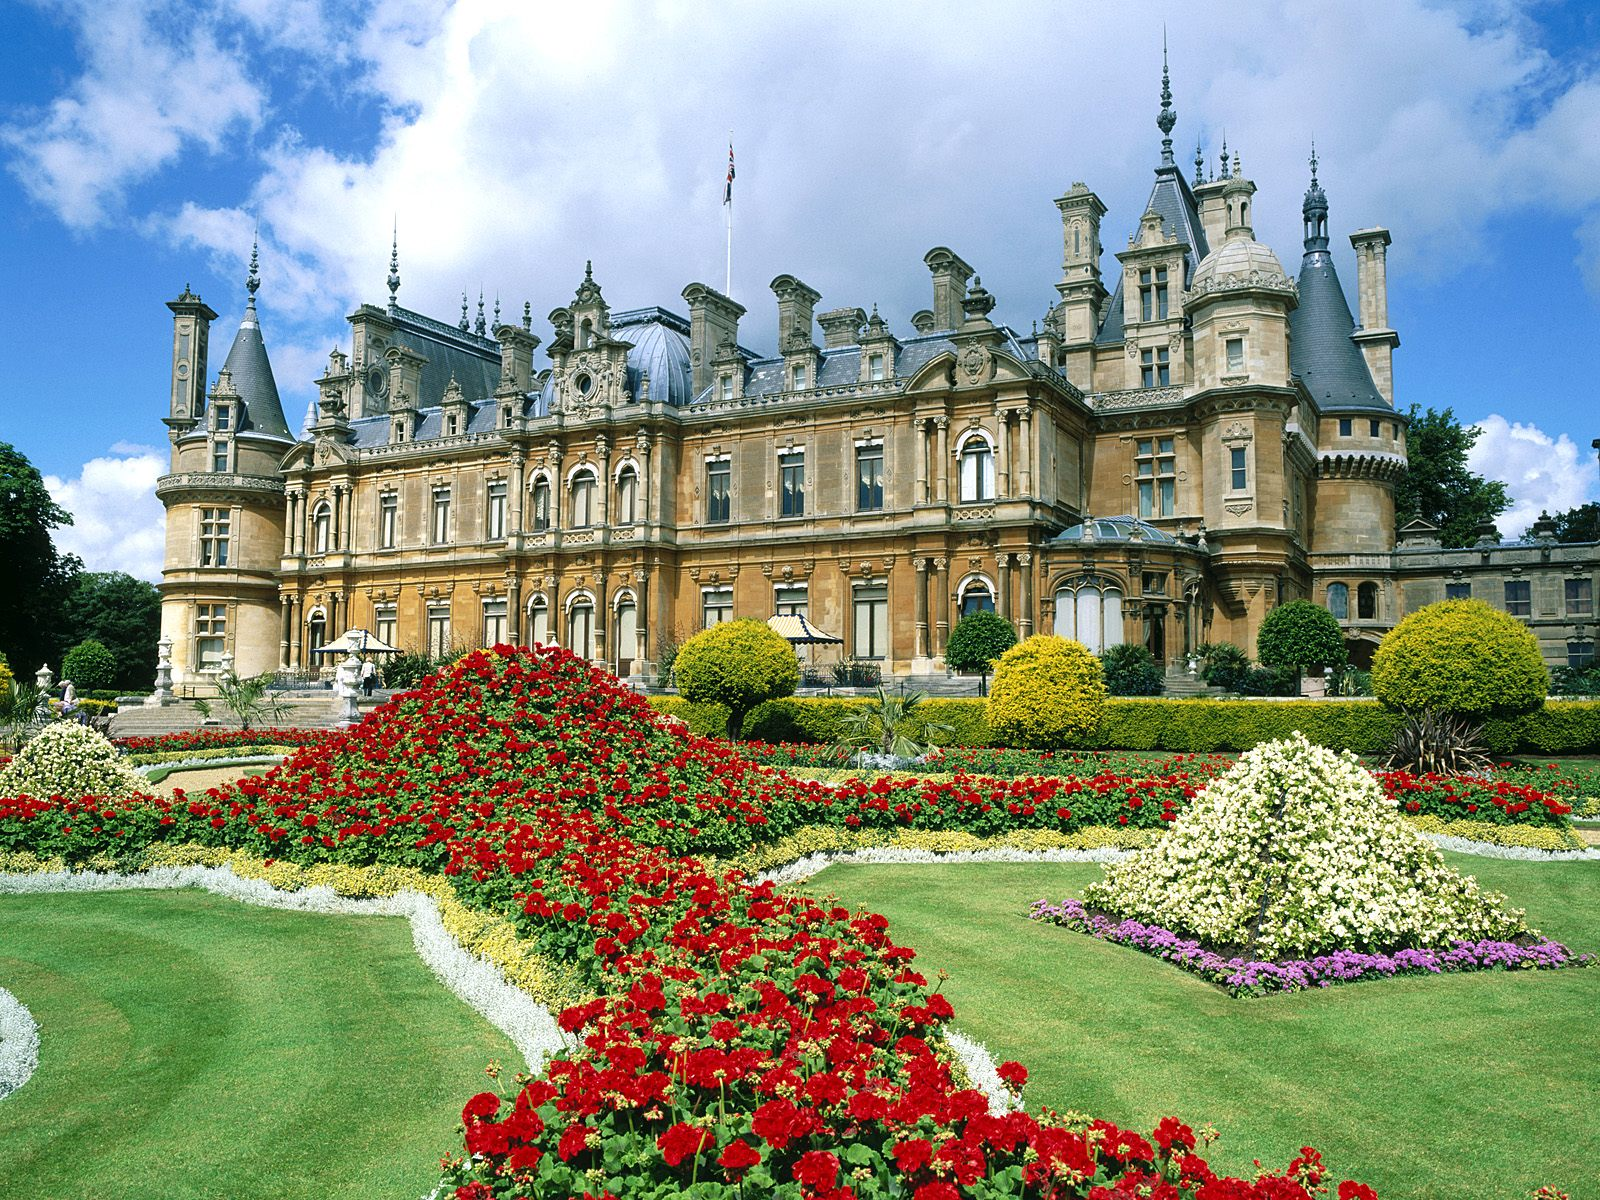 Waddesdon-Manor-Buckinghamshire-England.jpg